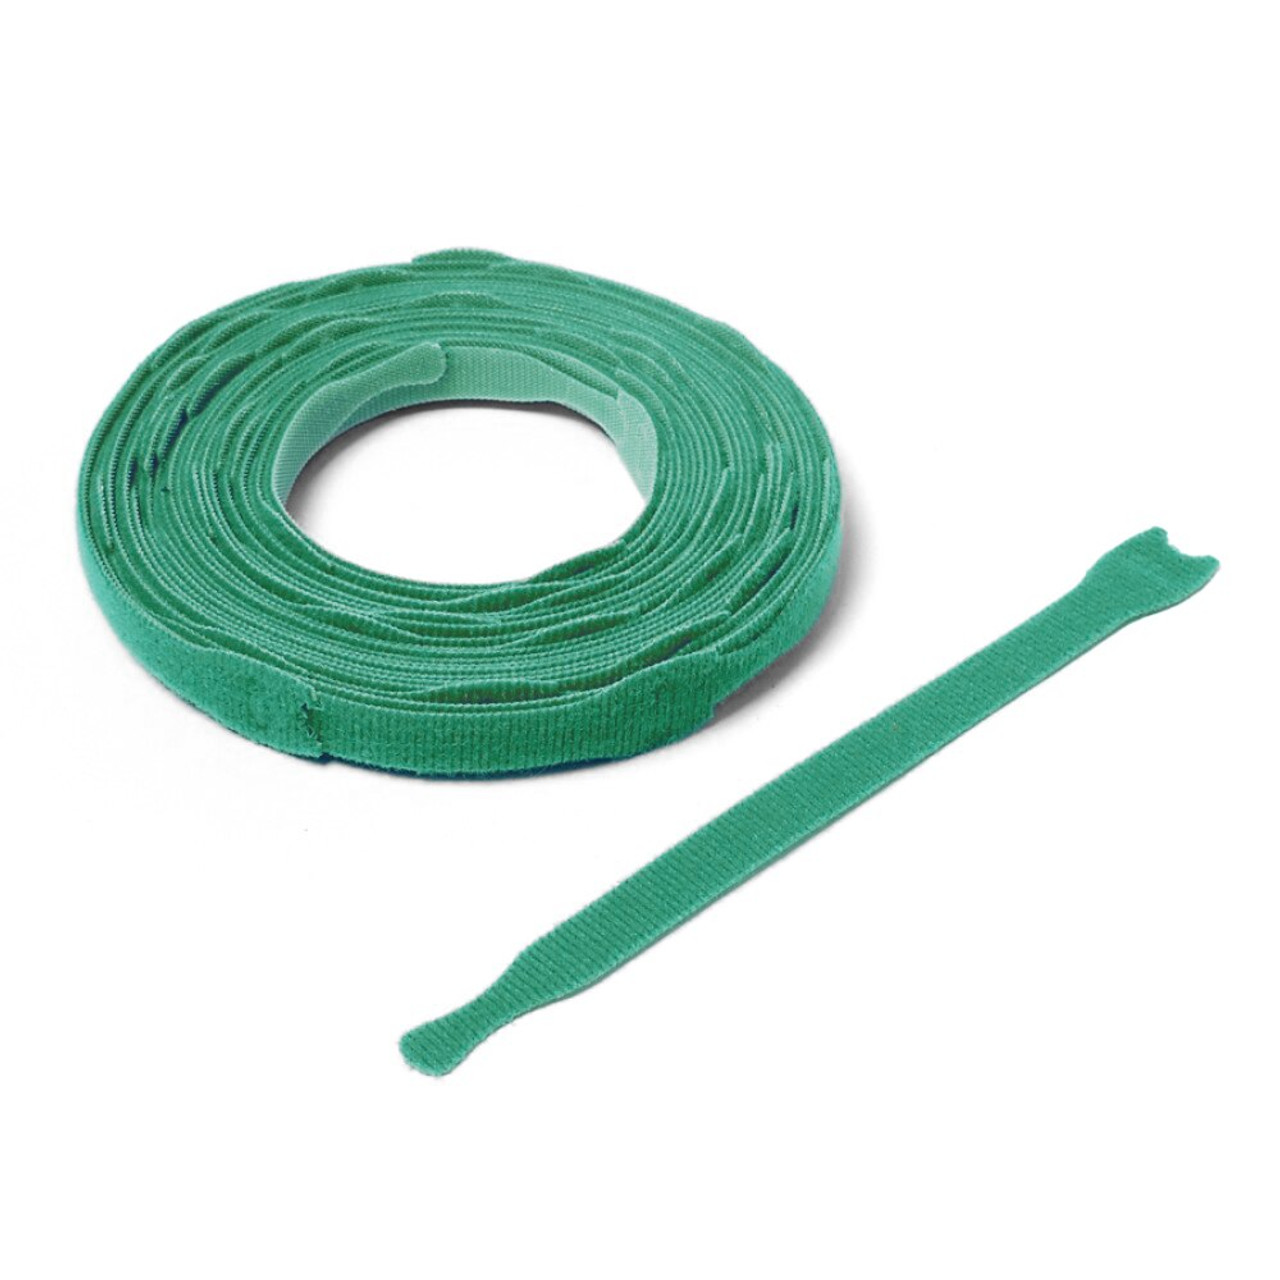 VELCRO ® Brand ONE-WRAP® Die-Cut Straps - Green